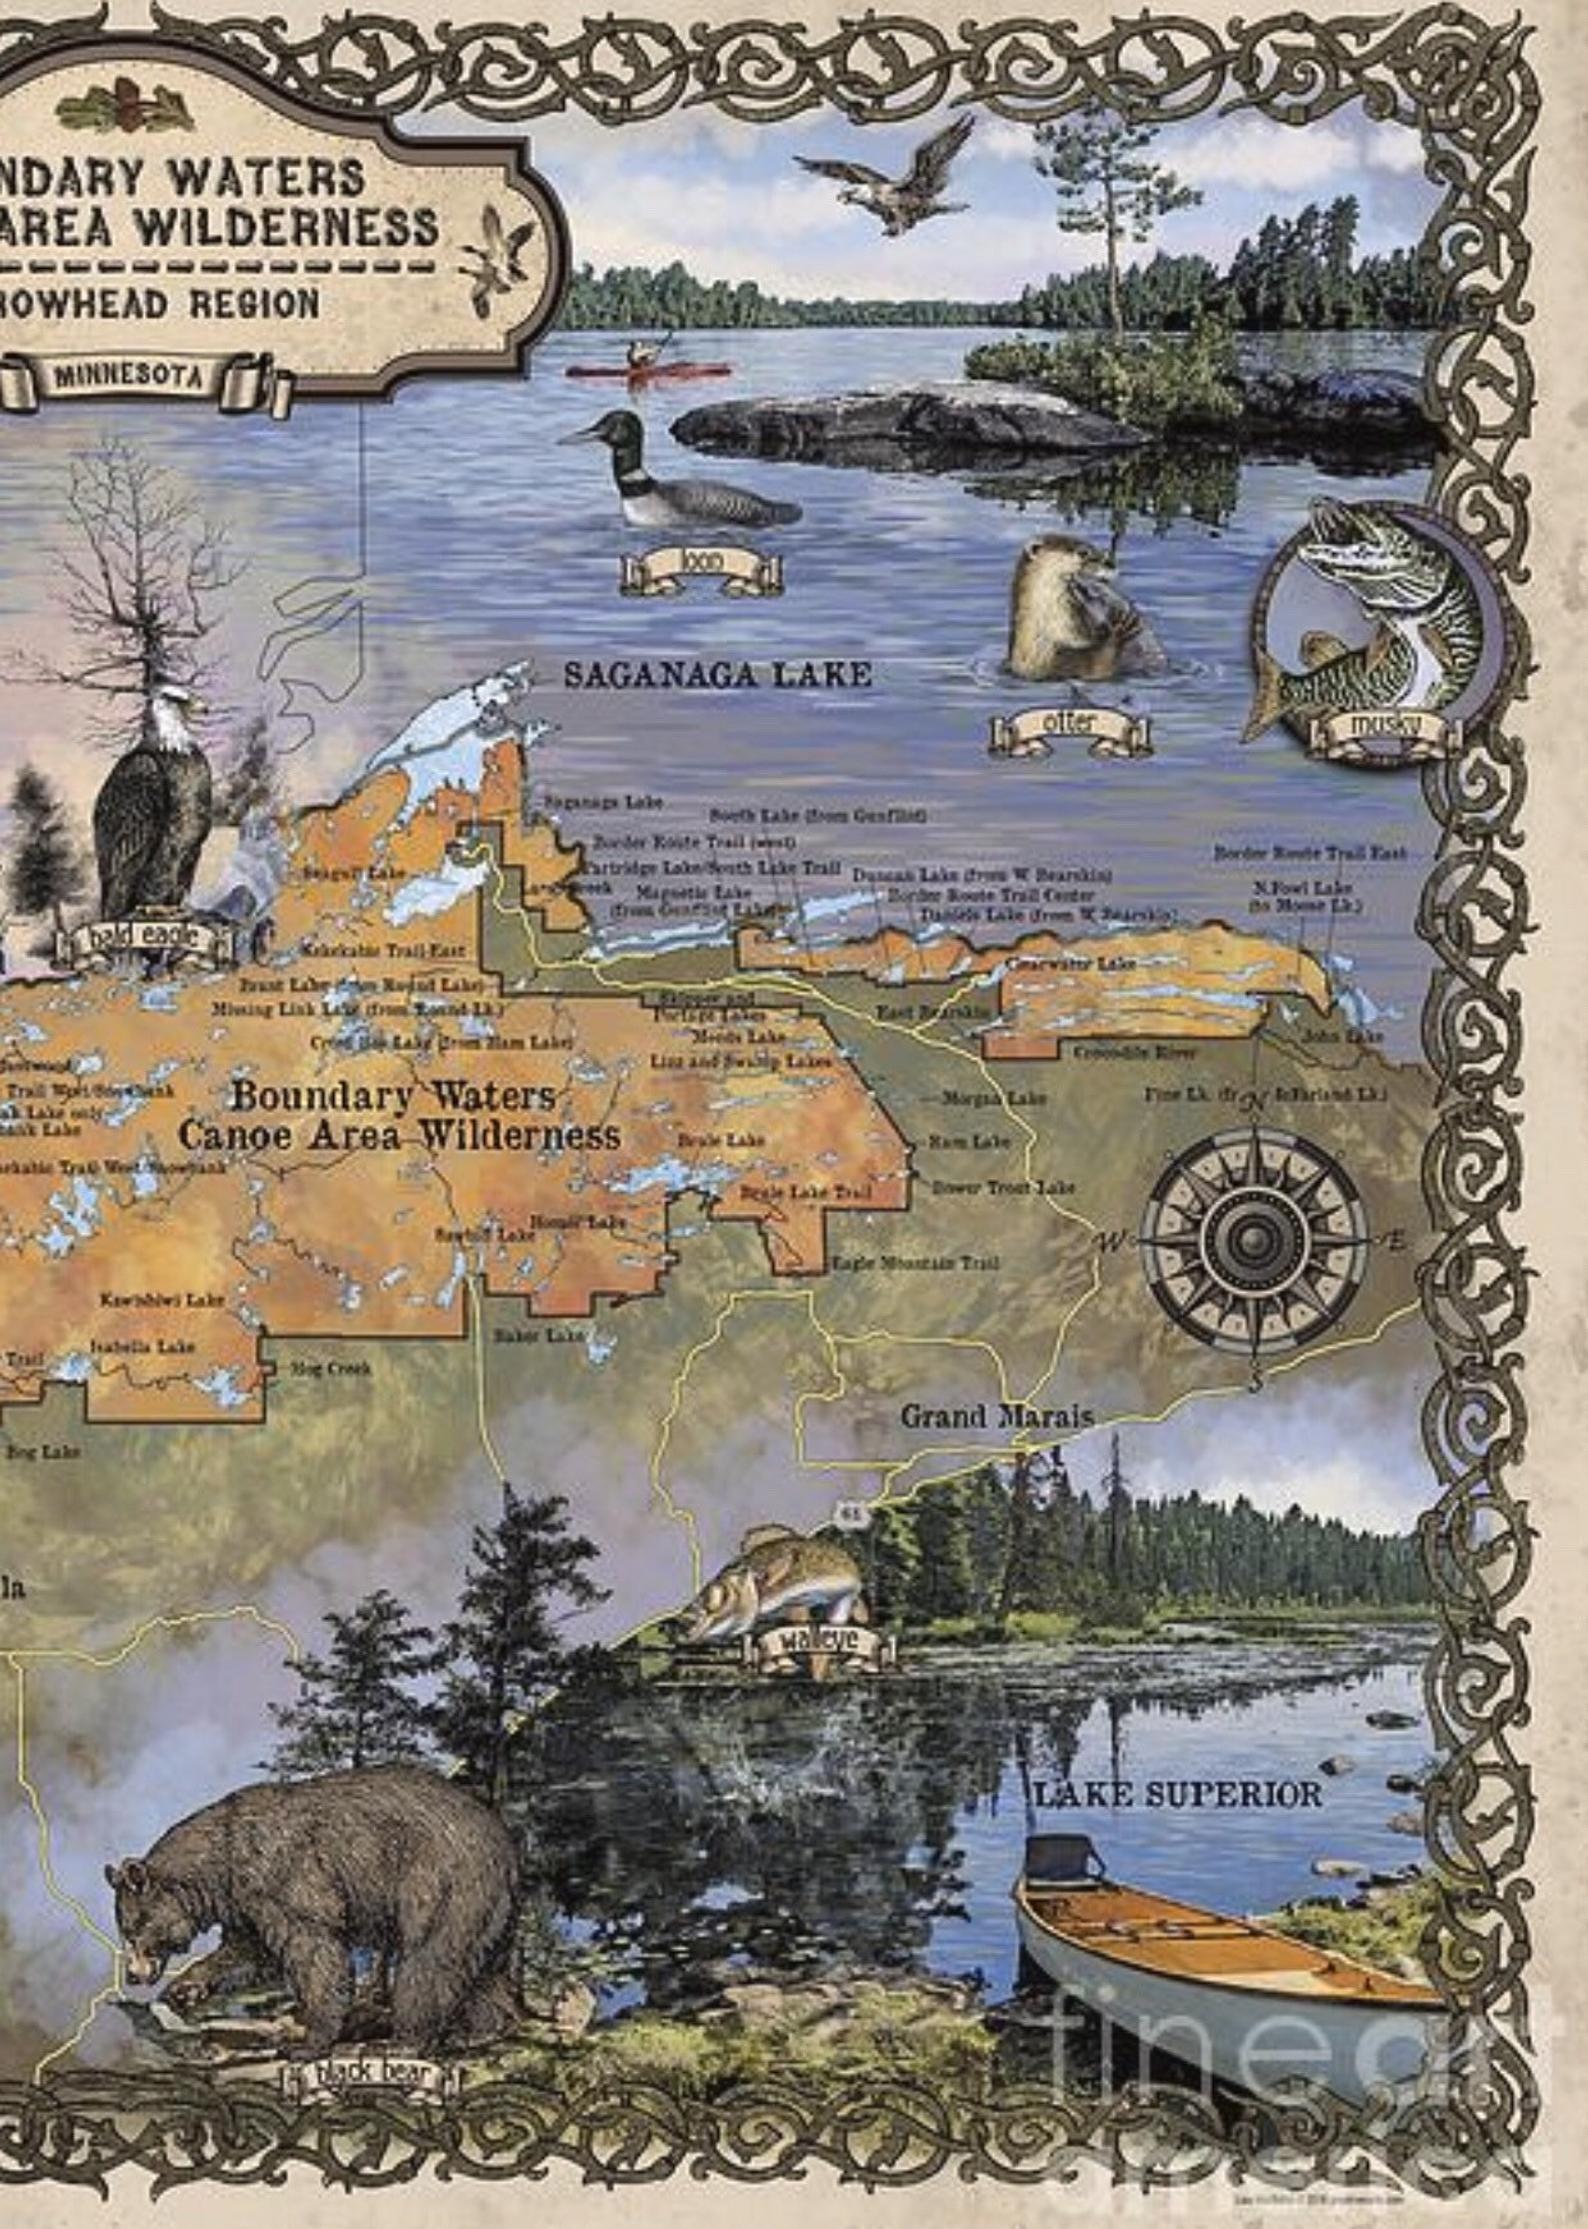 Boundary Waters Canoe Gift Minnesota Gift Large Wall Map Etsy Boundary Waters Canoe Area Boundary Waters Adventure Gifts